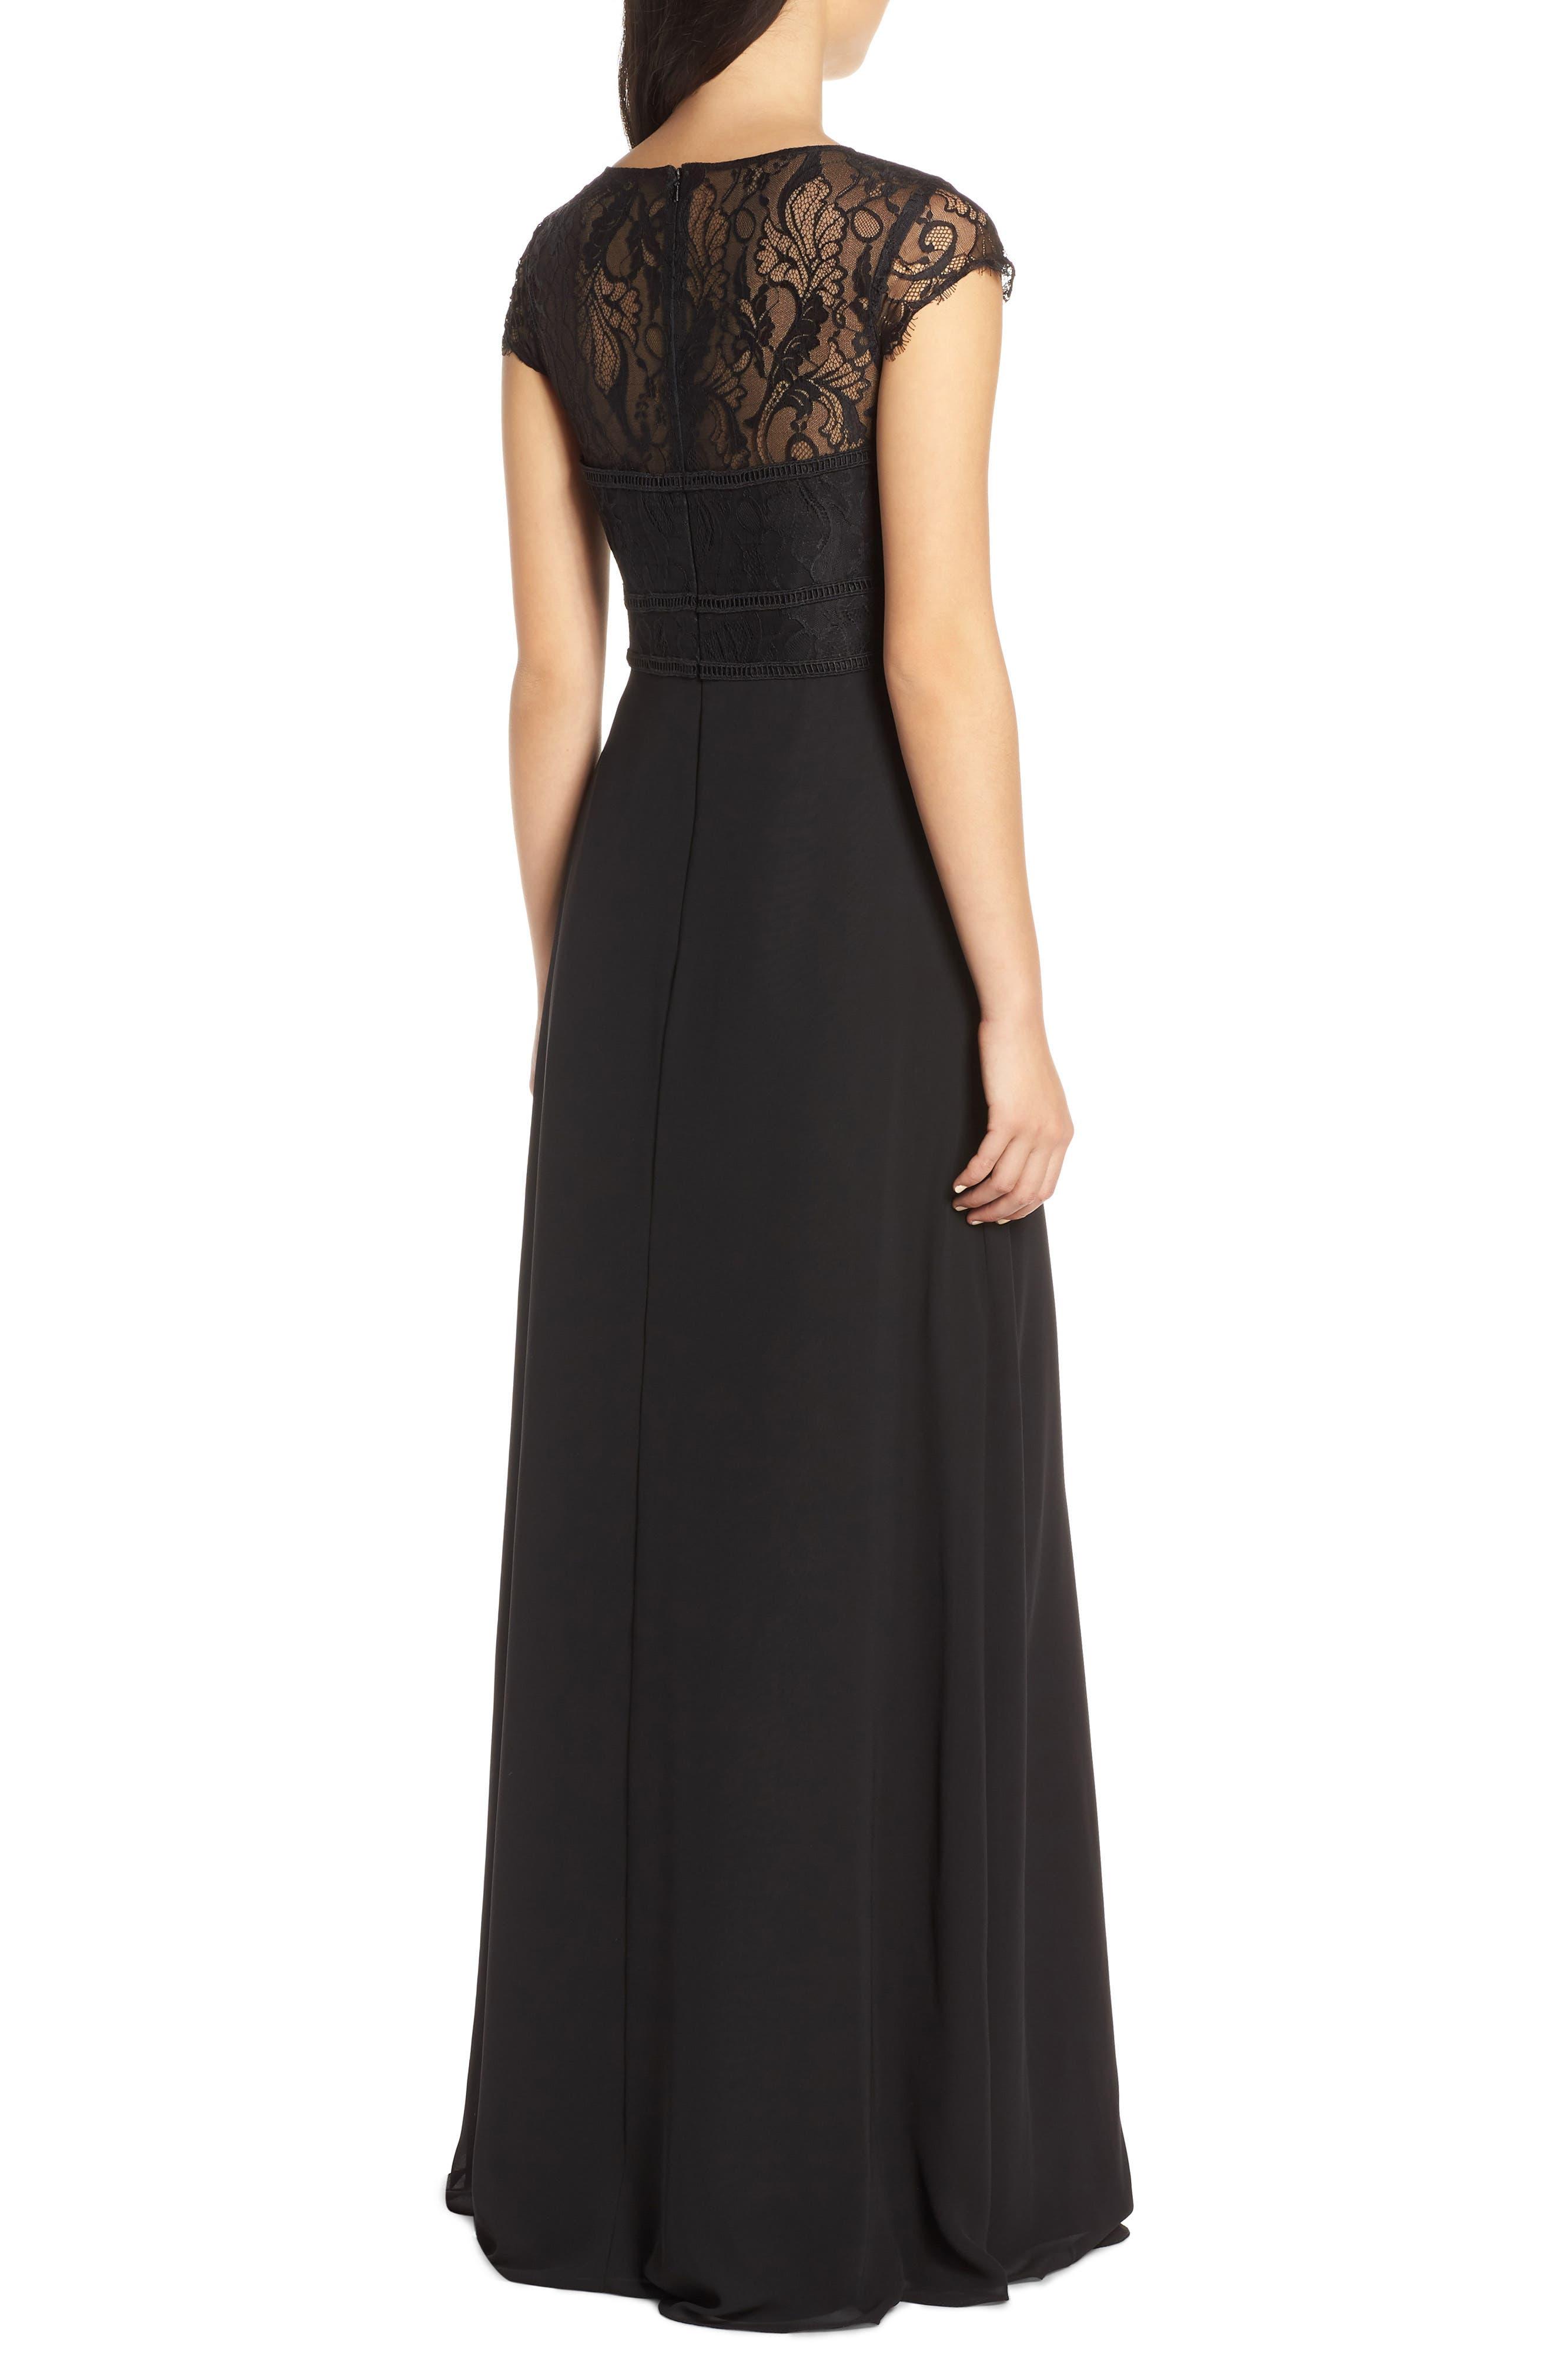 HAYLEY PAIGE OCCASIONS,                             Lace Bodice Chiffon Evening Dress,                             Alternate thumbnail 2, color,                             BLACK / BLACK